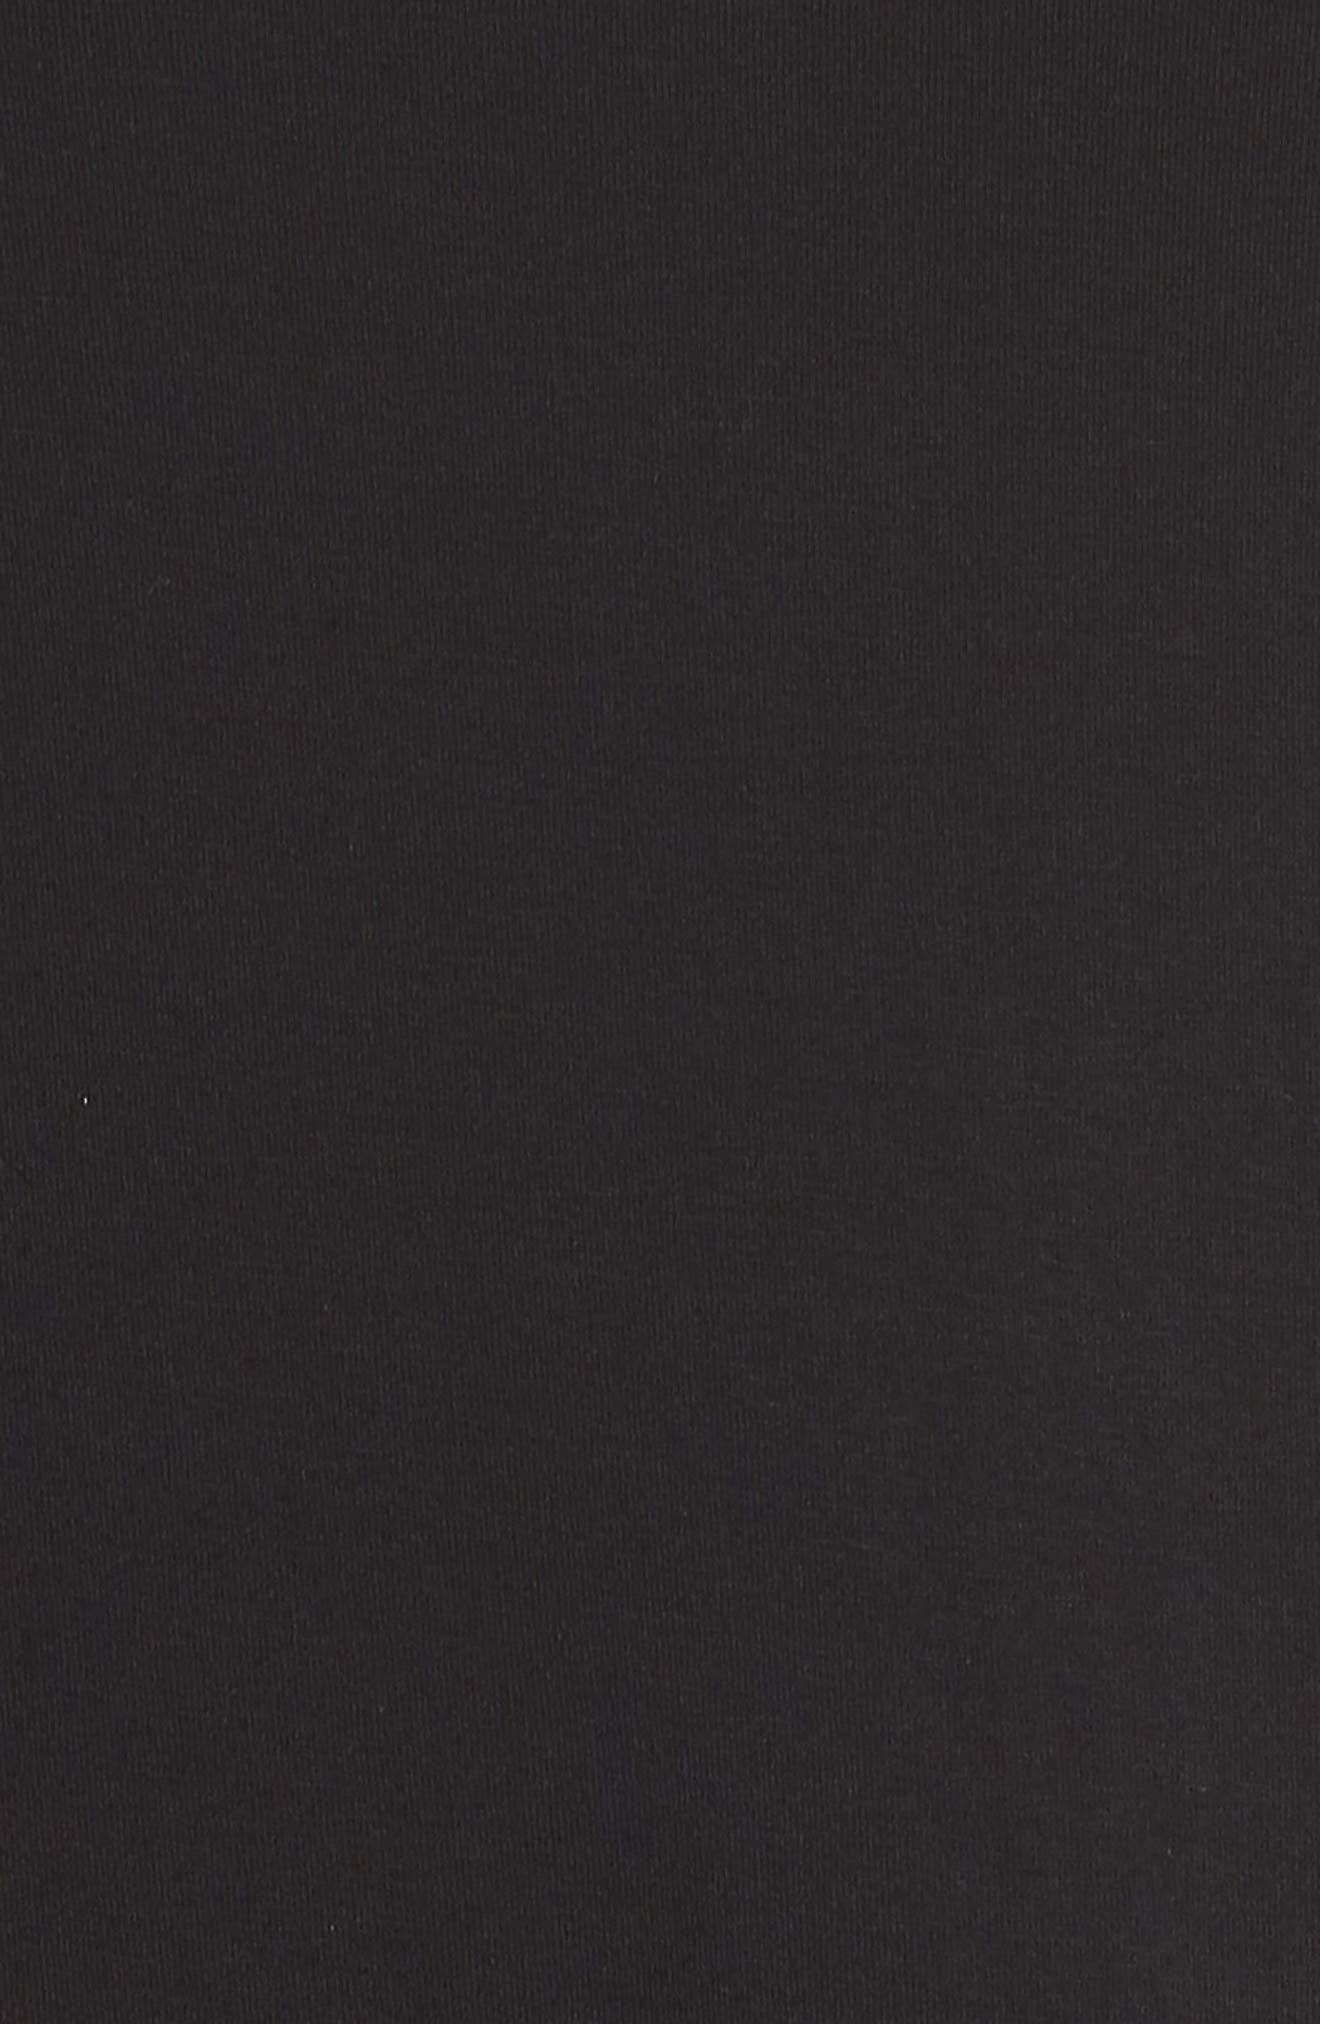 Eyelet Yoke Shift Dress,                             Alternate thumbnail 6, color,                             RICH BLACK